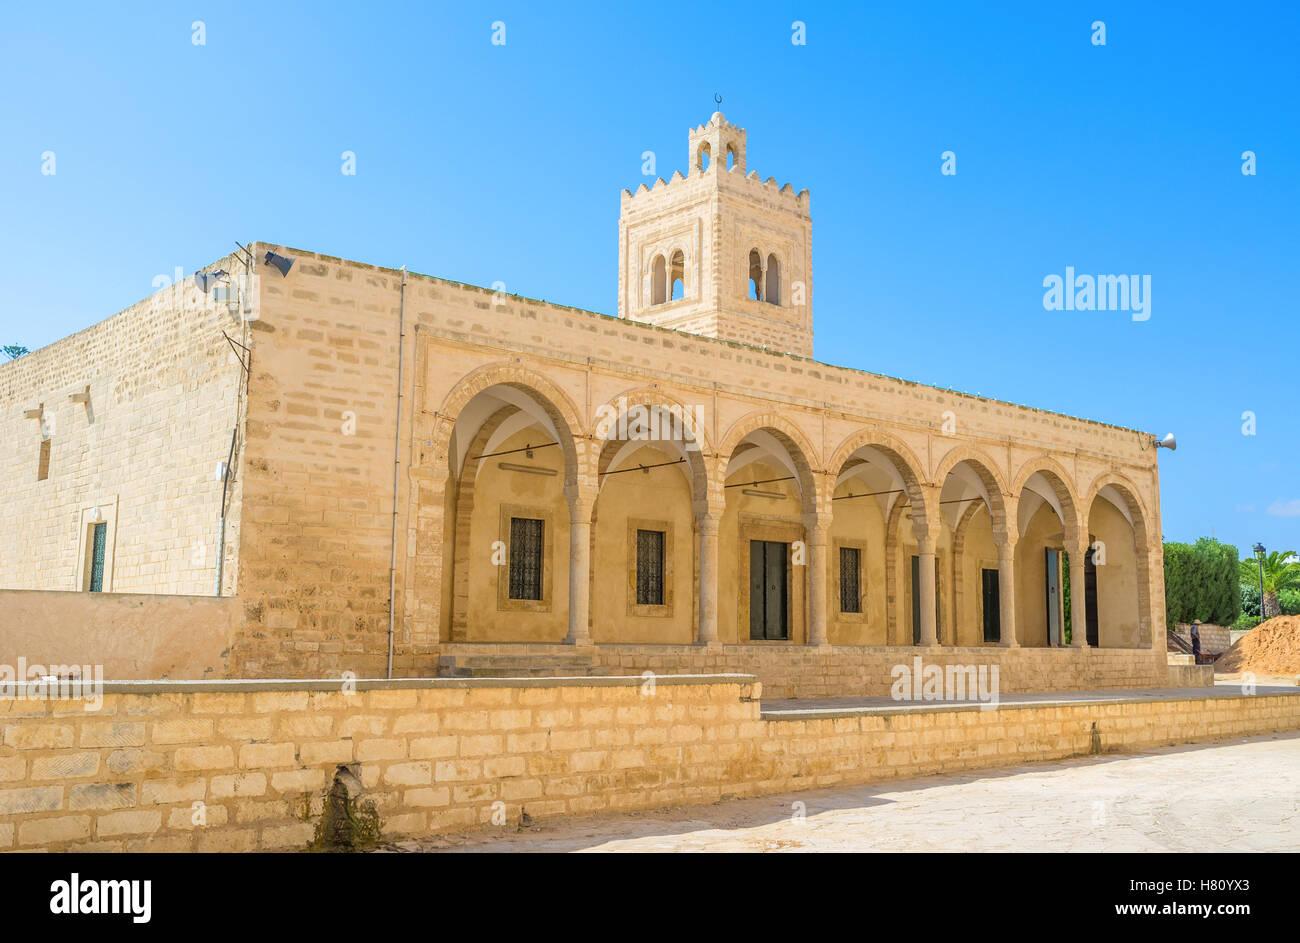 La façade de la Grande Mosquée médiévale, qui est voisin avec Ribat citadelle, Monastir, Tunisie. Photo Stock